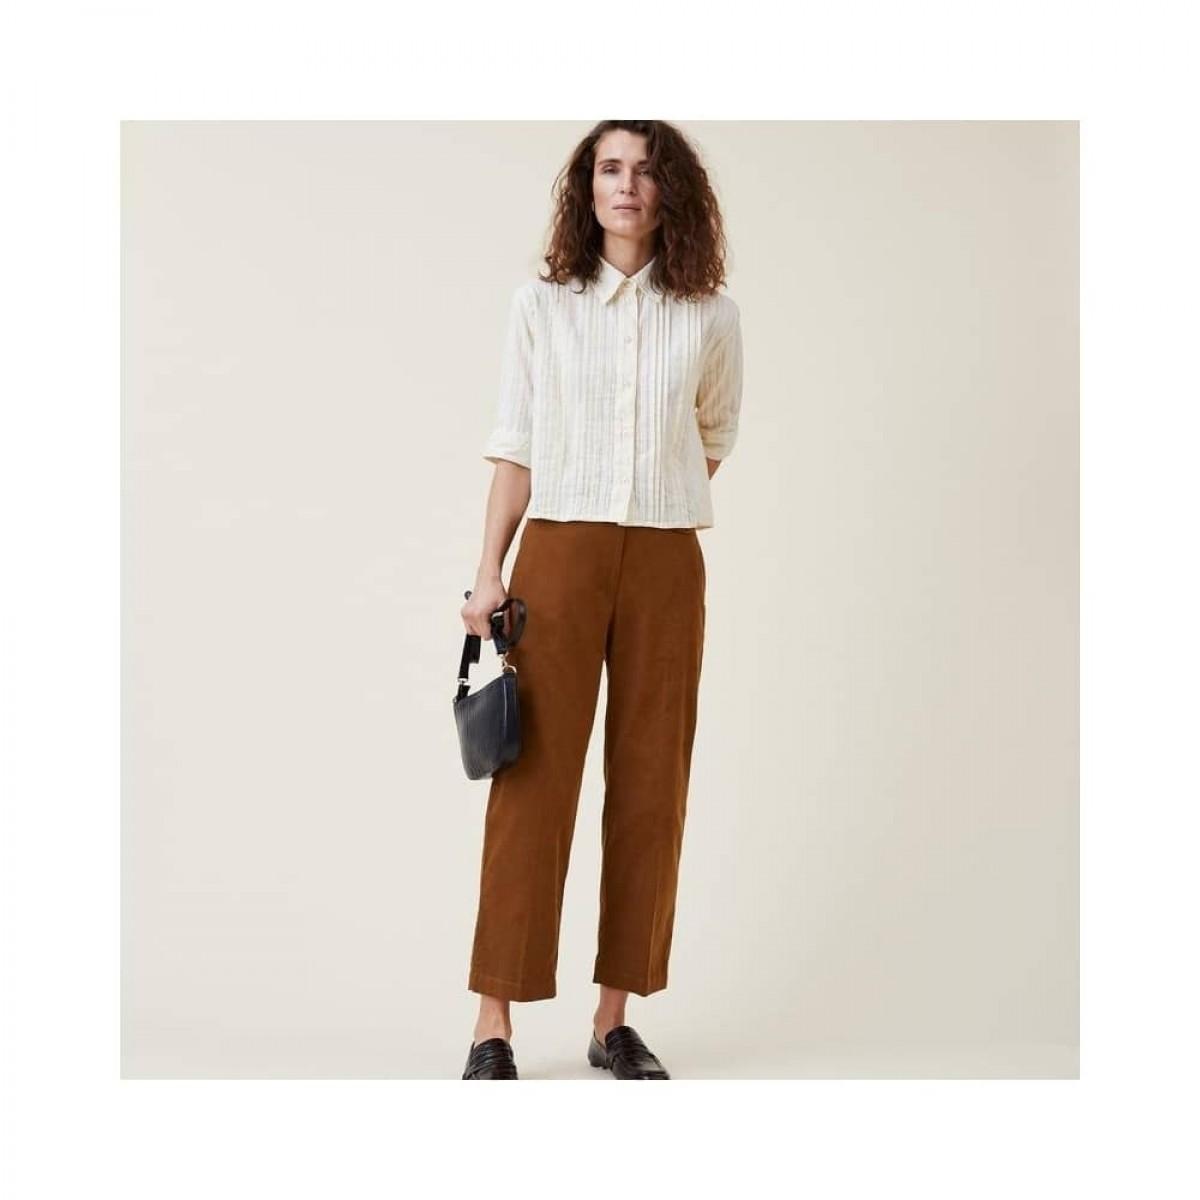 romala shirt - cream - model front